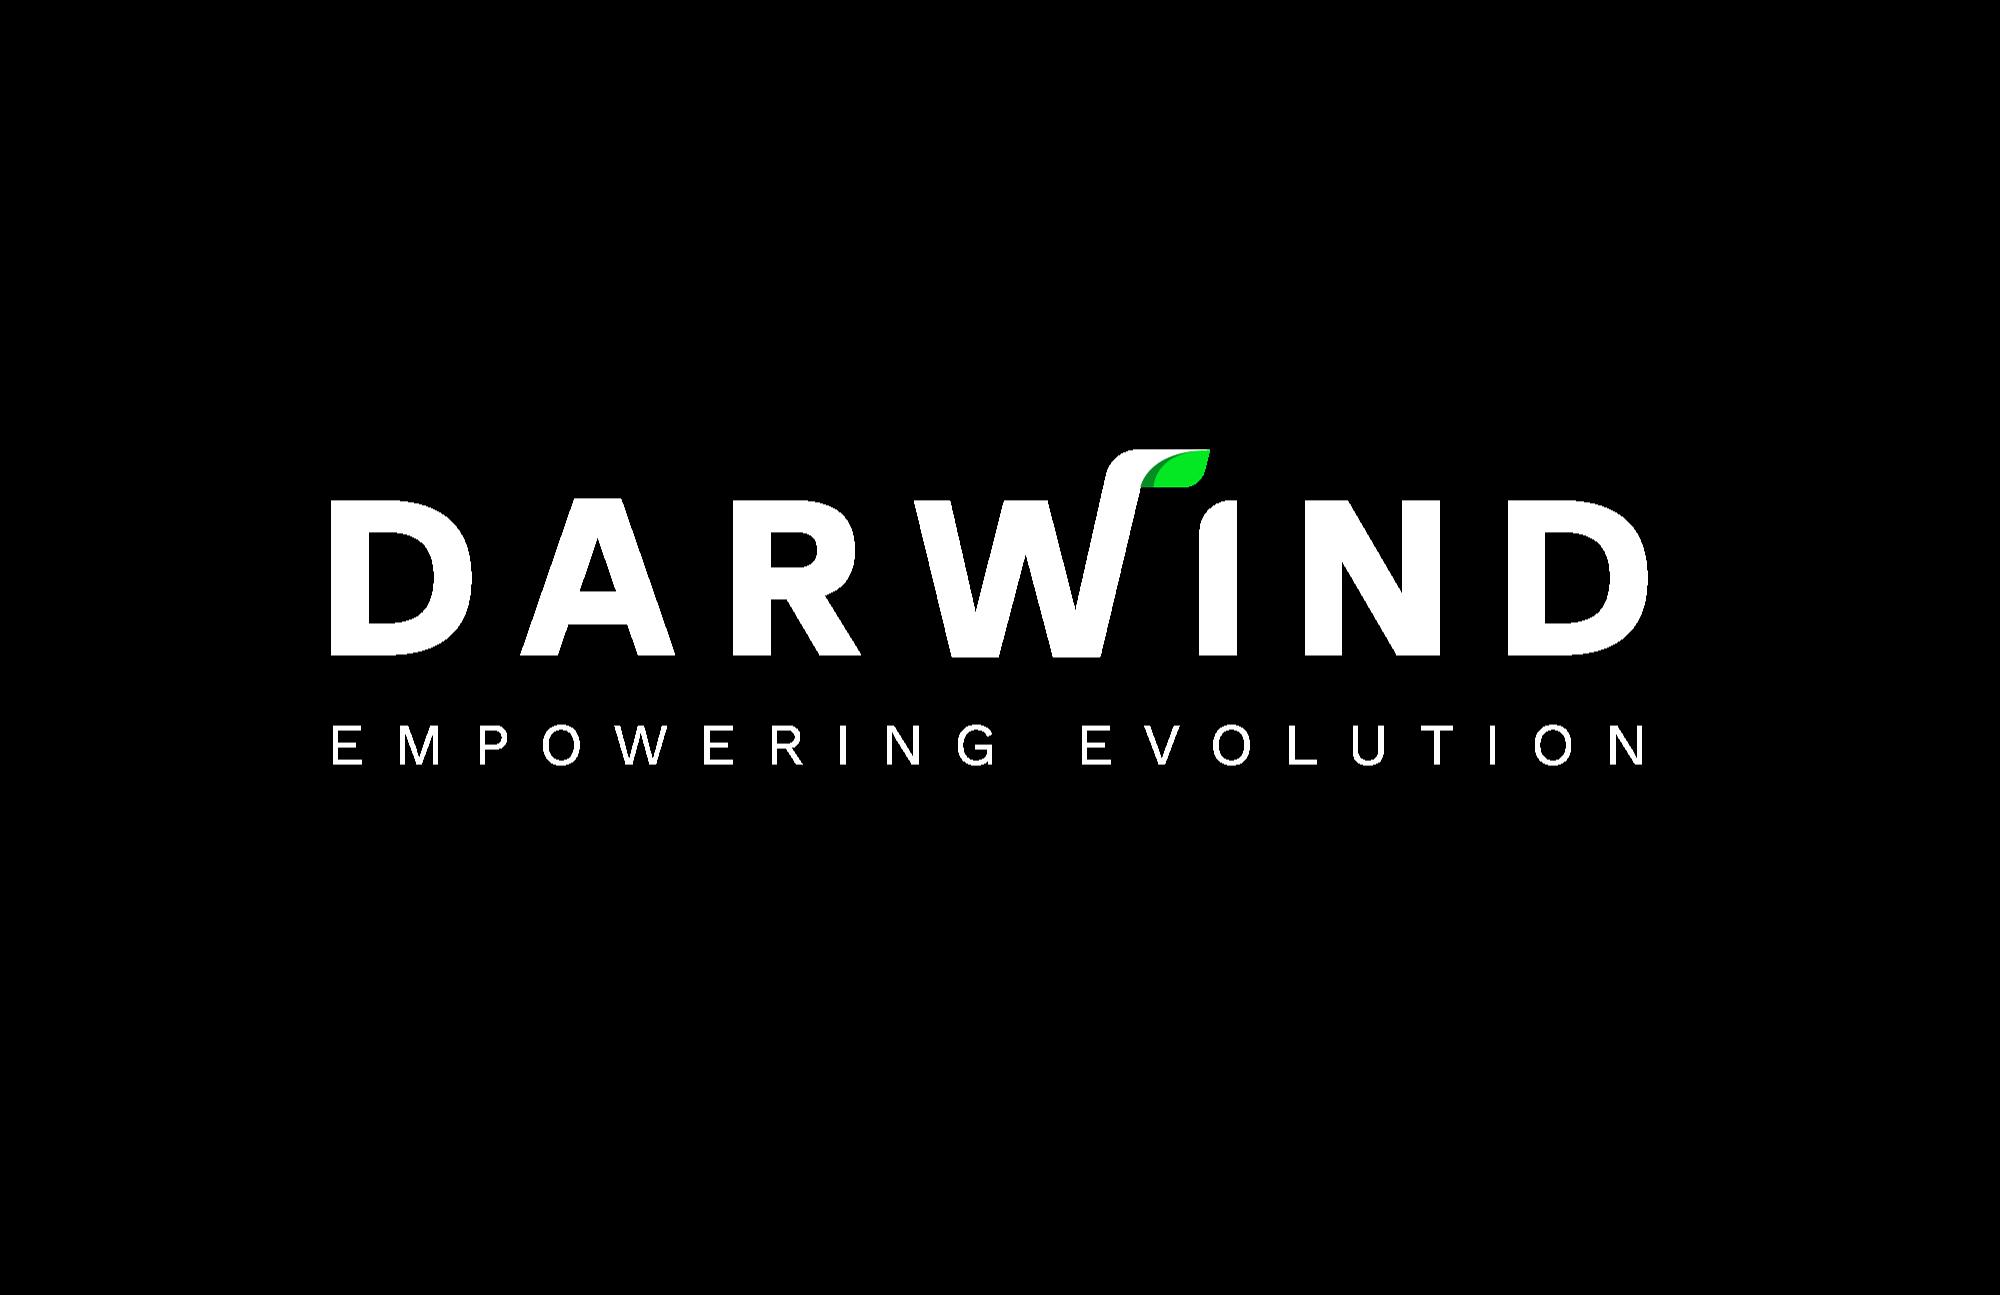 darwind-beta-b.png